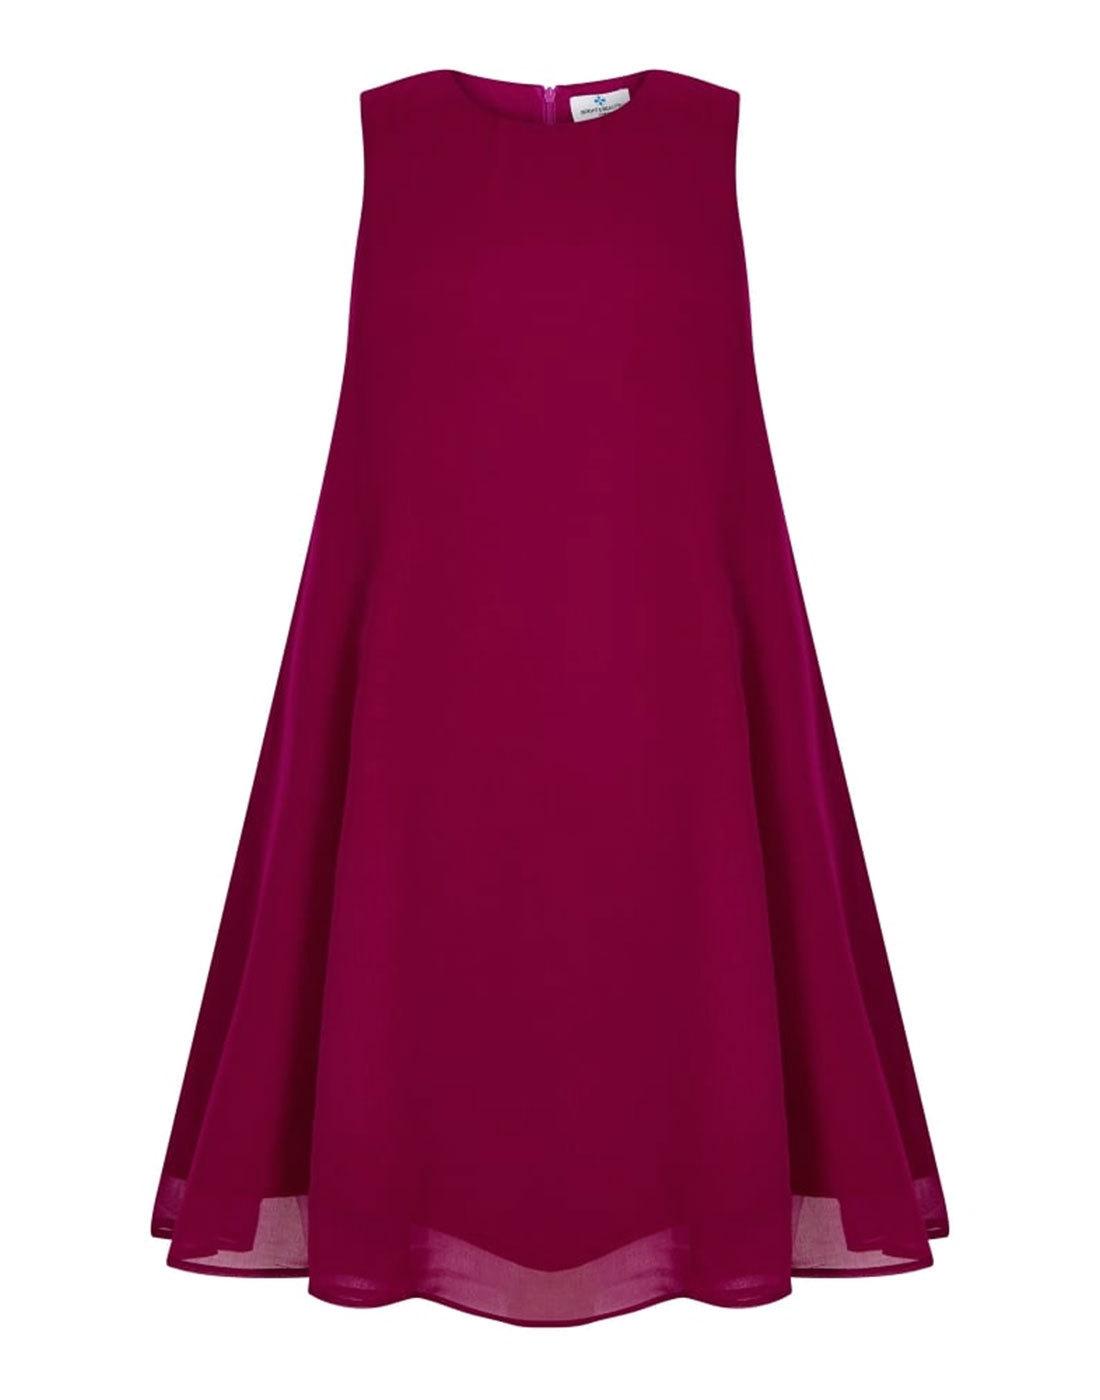 Tessa BRIGHT & BEAUTIFUL Baby Doll Dress Fuchsia